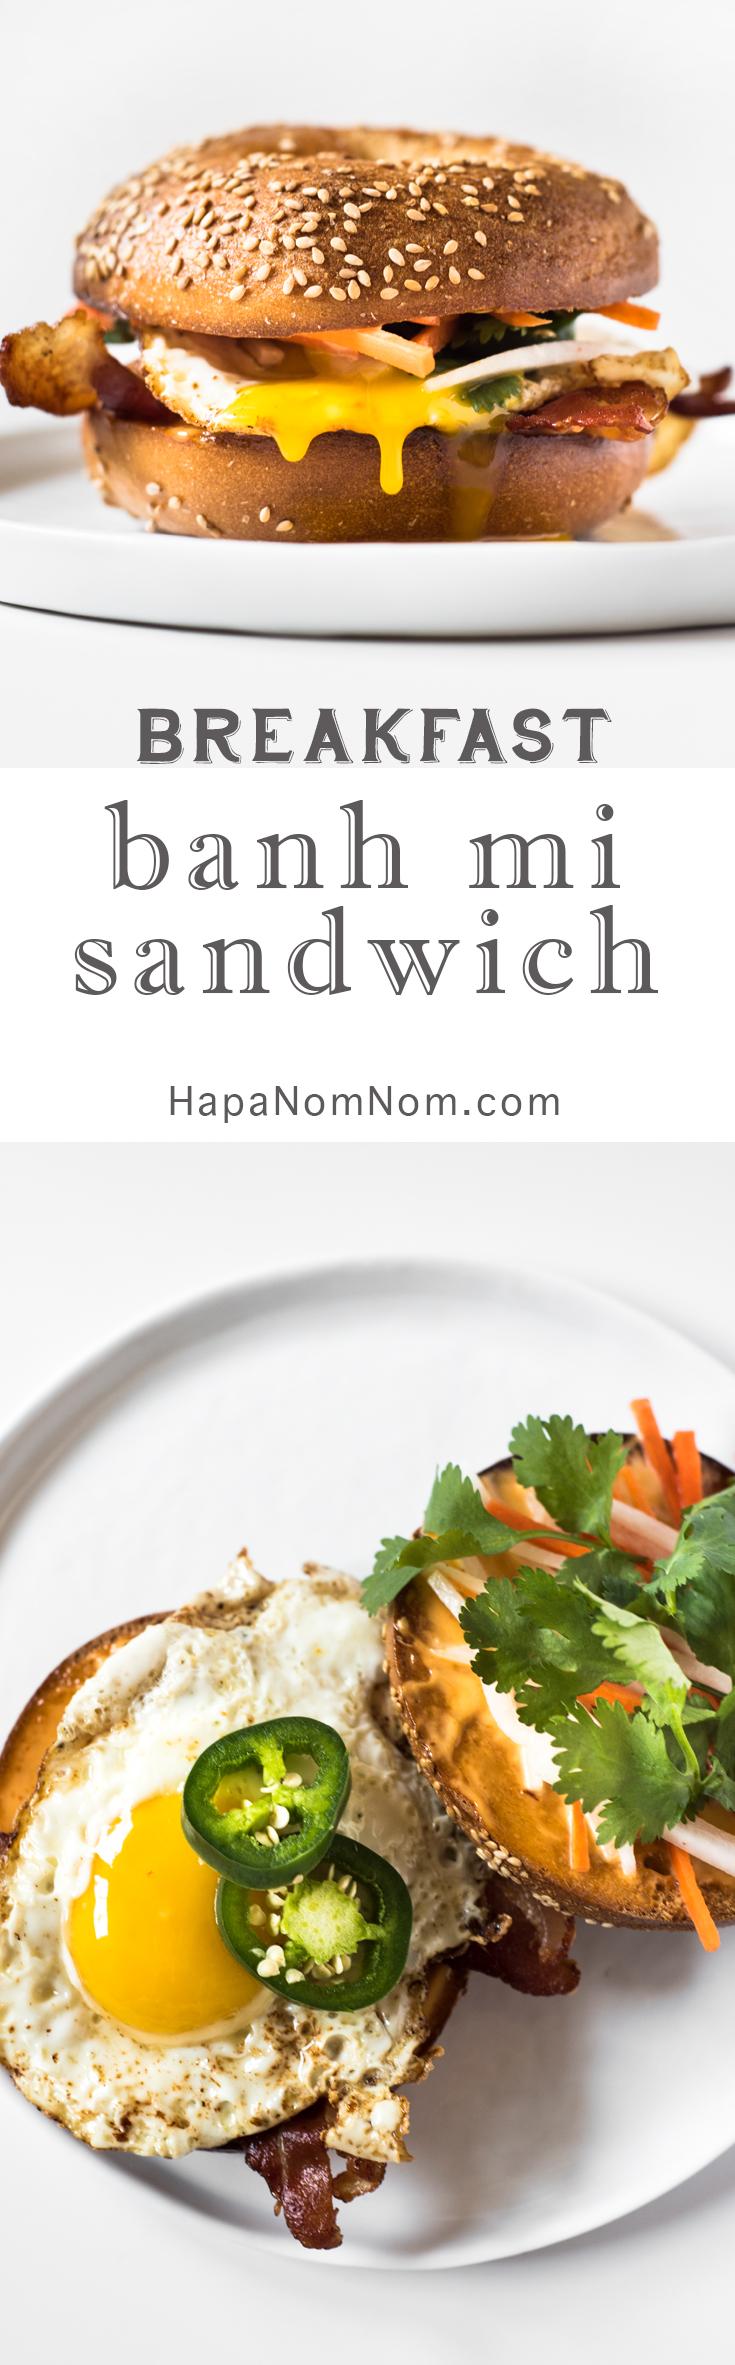 Breakfast-Banh-Mi-Pin1.jpg